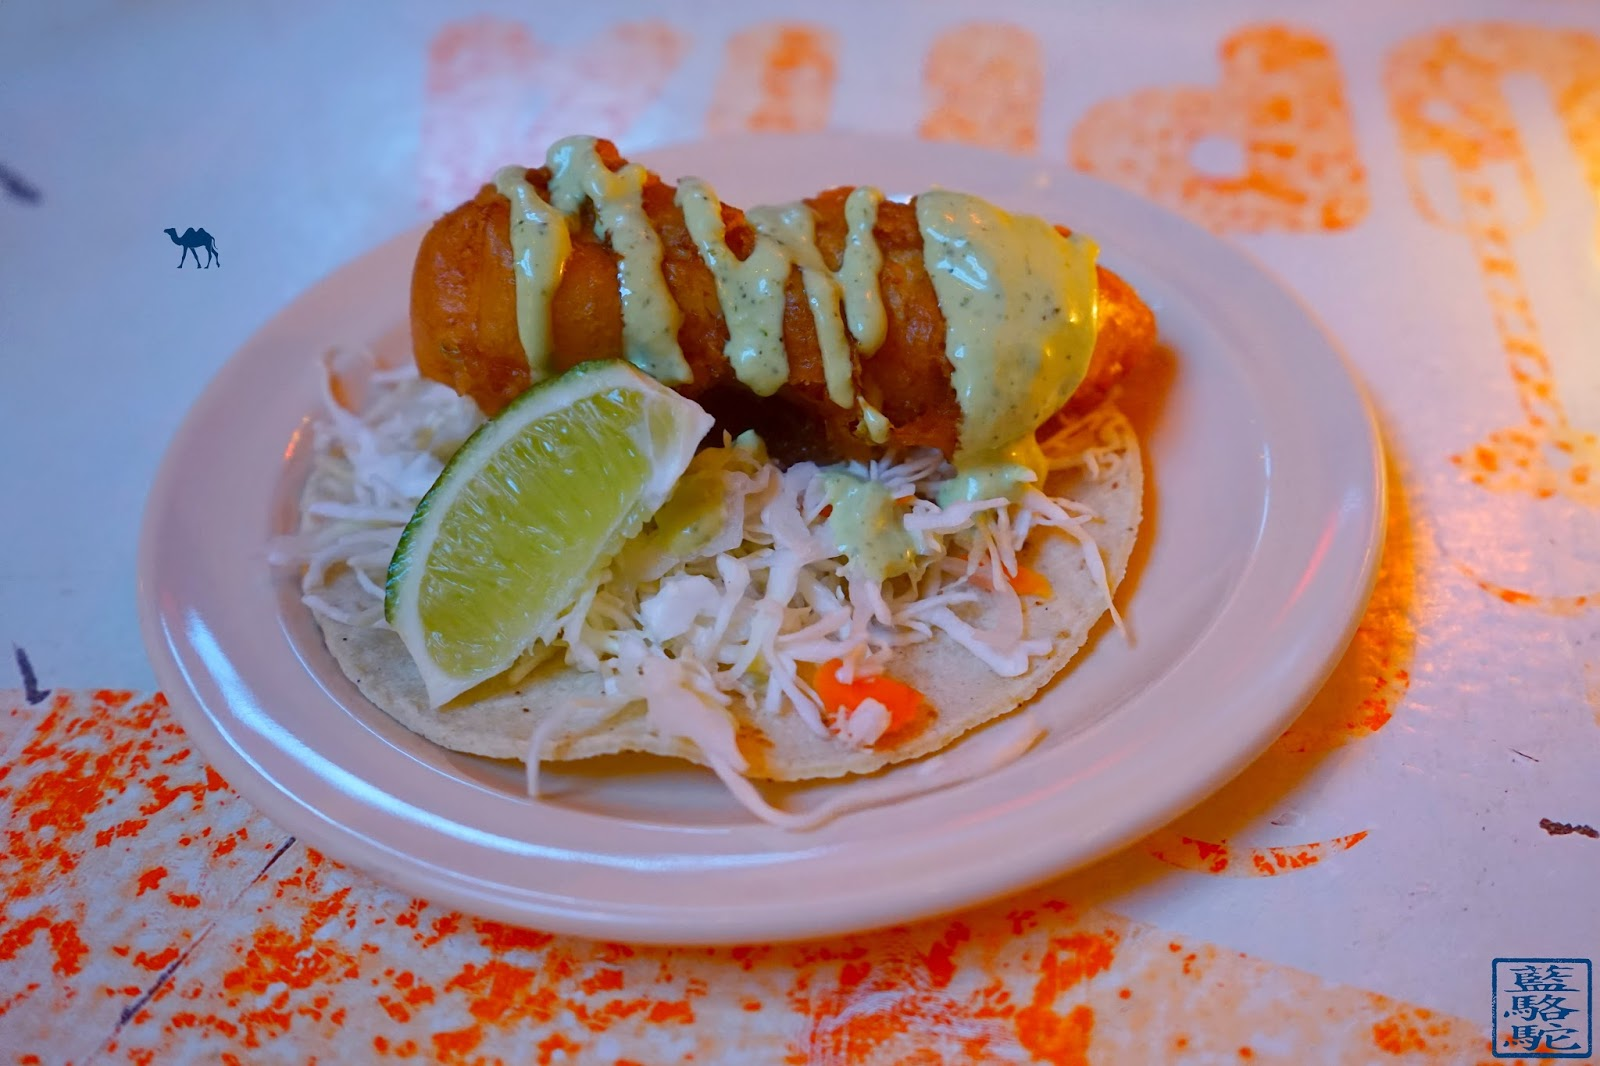 Le Chameau Bleu - Tacombi - Crispy Fish Tacos